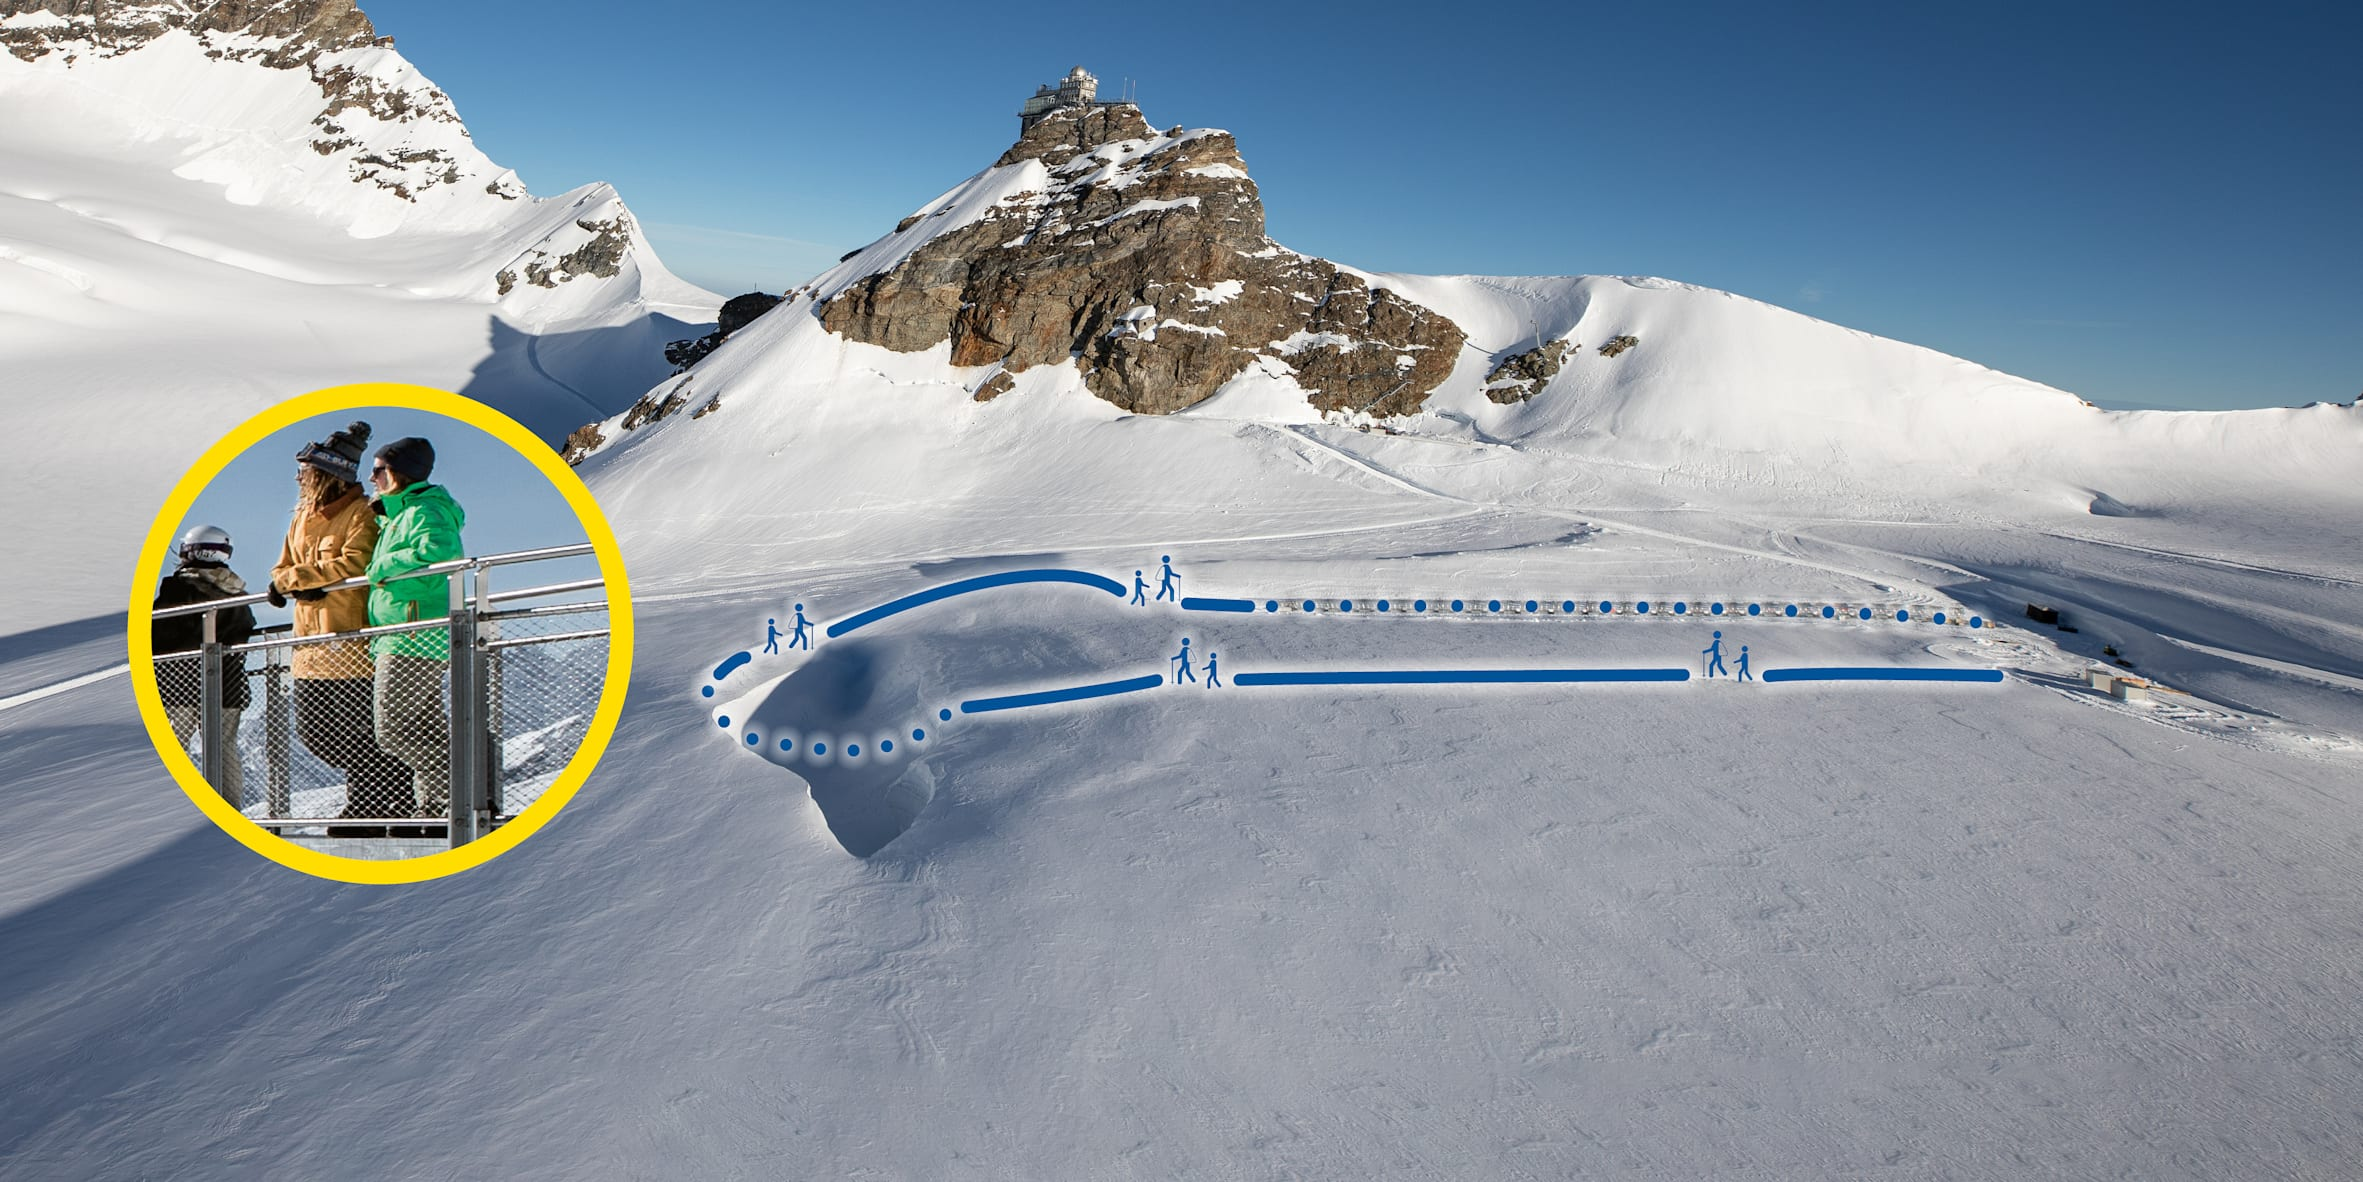 Erlebnisse-Aktivitaeten, Gletscher-Erlebnis, Jungfraujoch-Top-of-Europe, jungfrau.ch